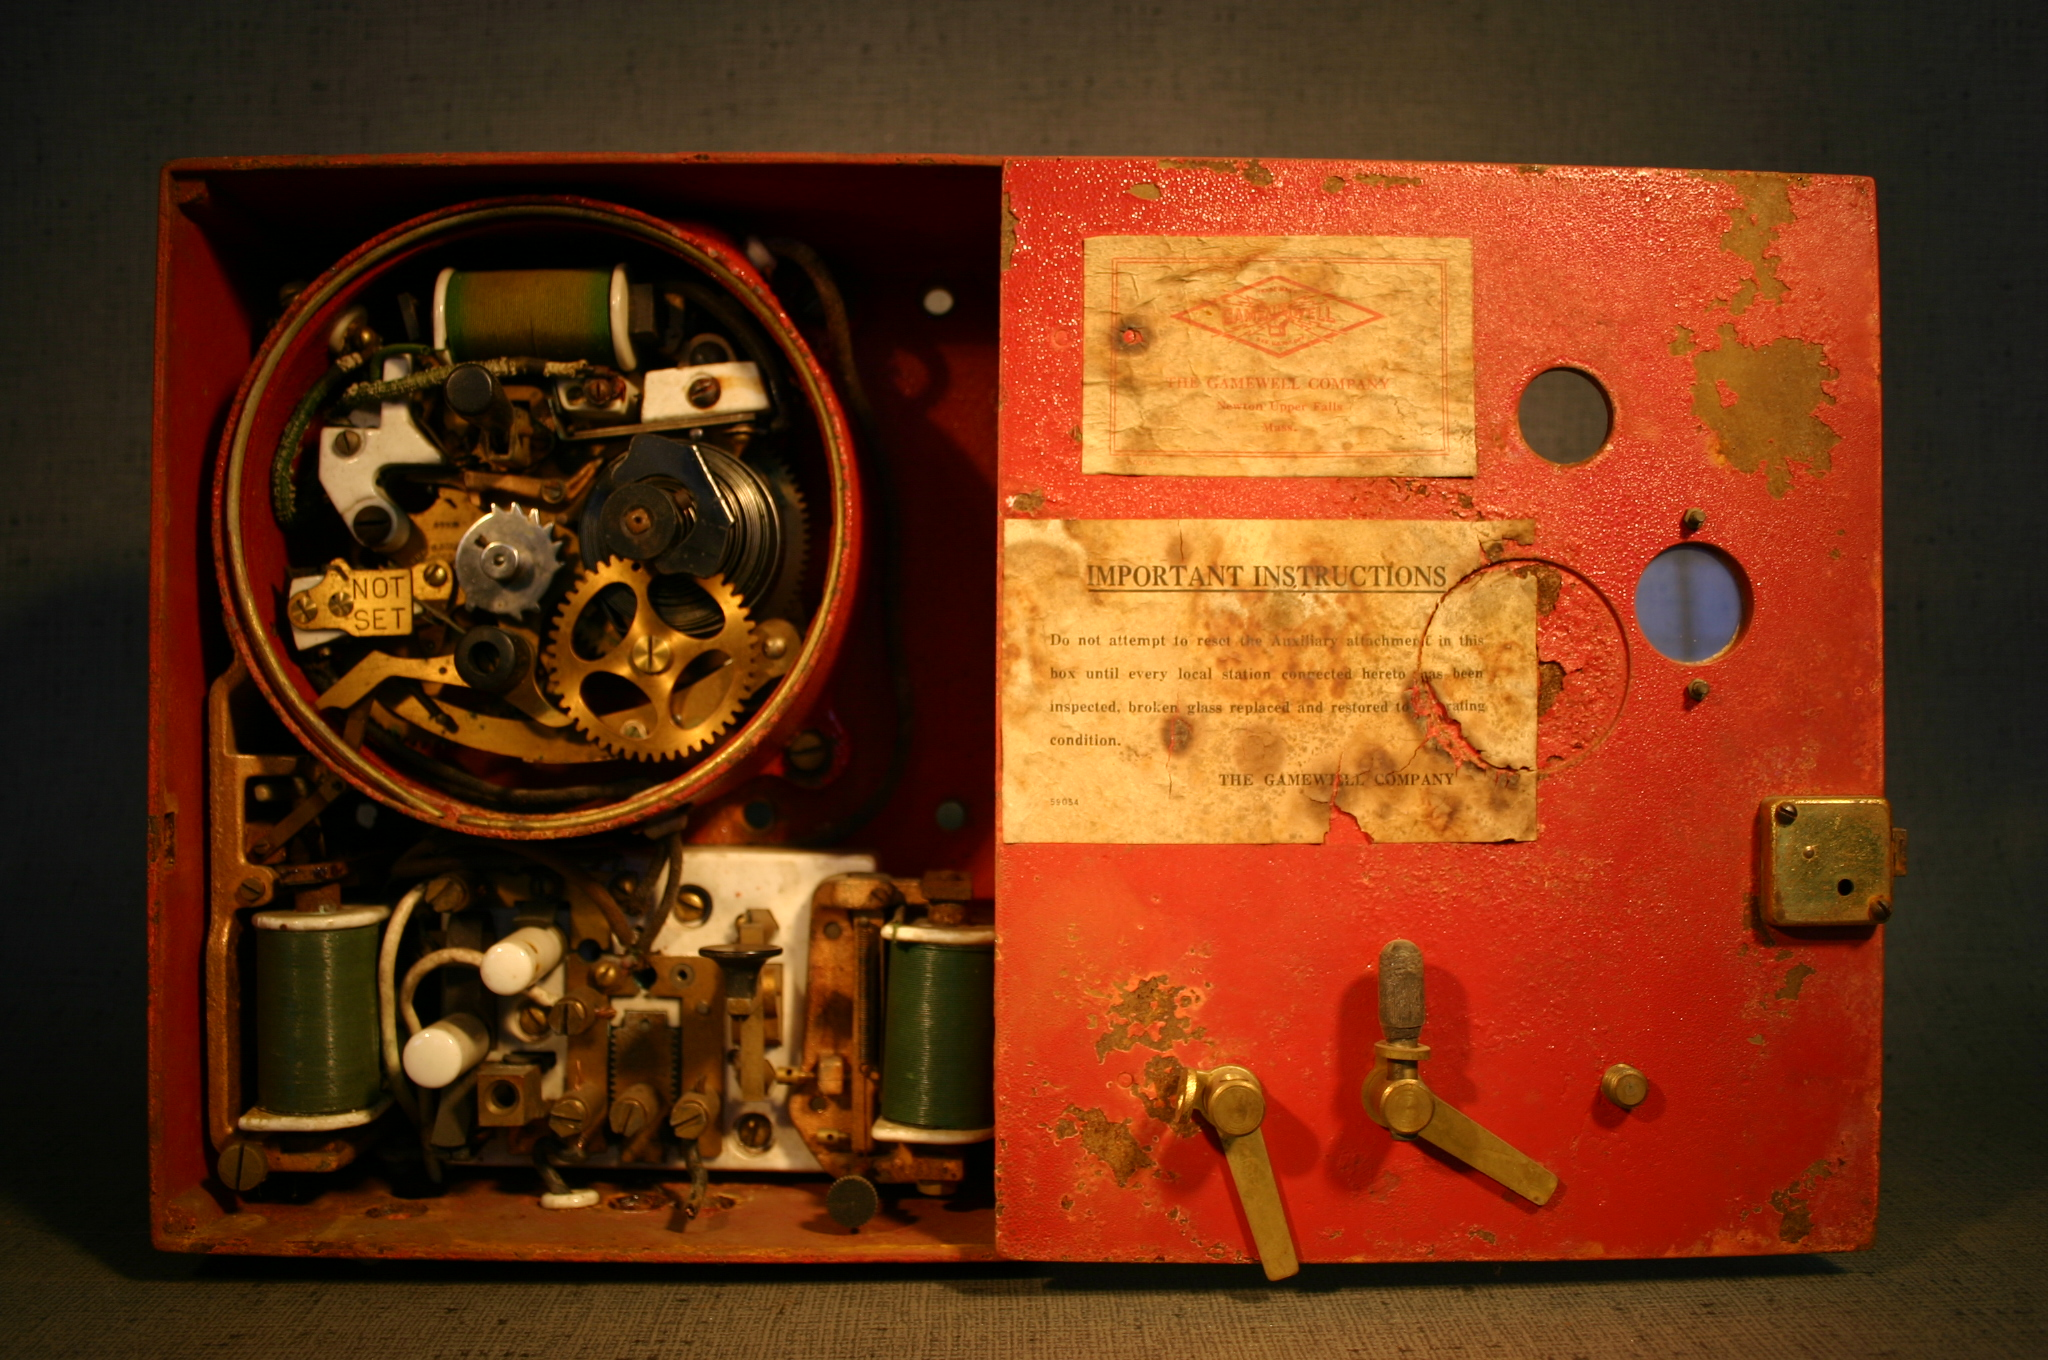 Antique Gamenell Alarm Mechanism